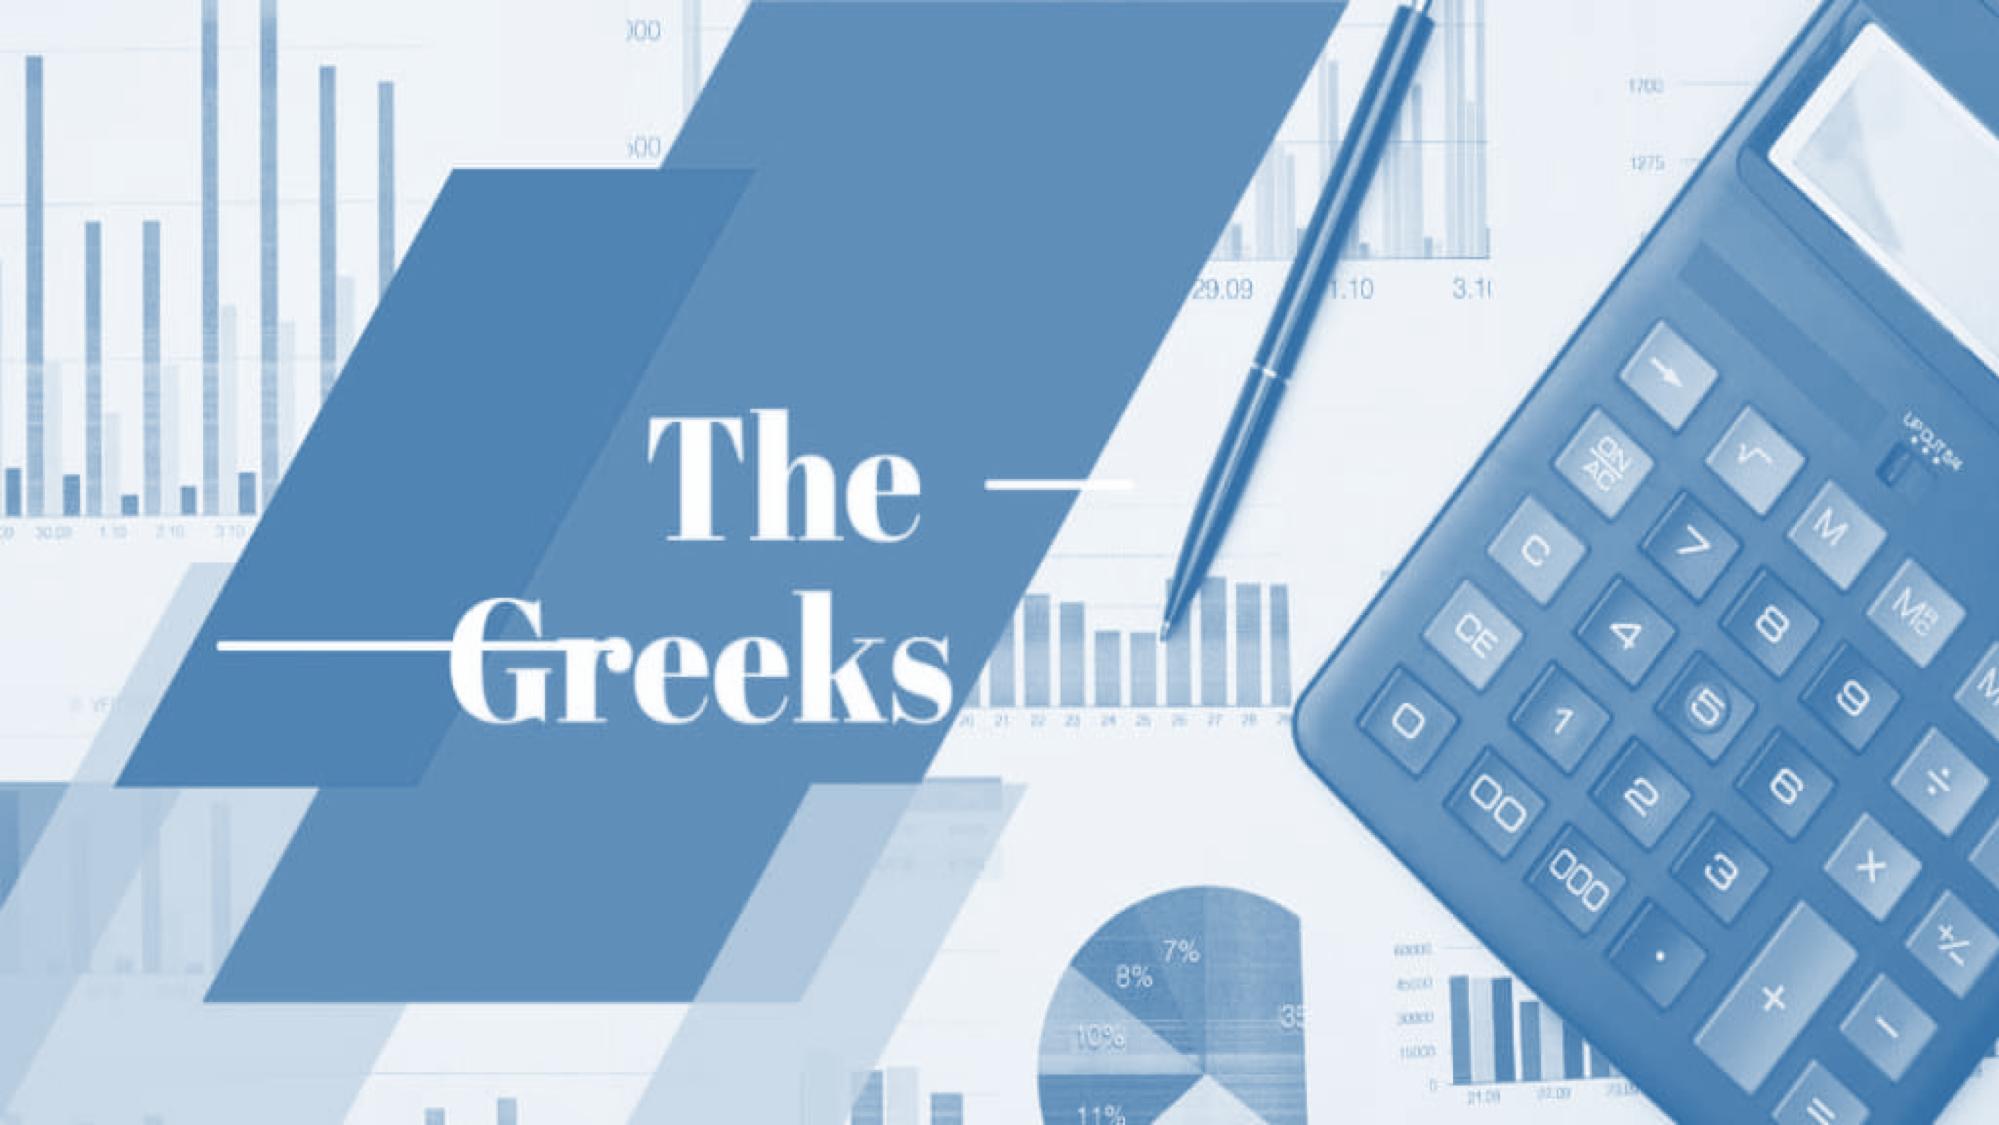 EO - The Greeks